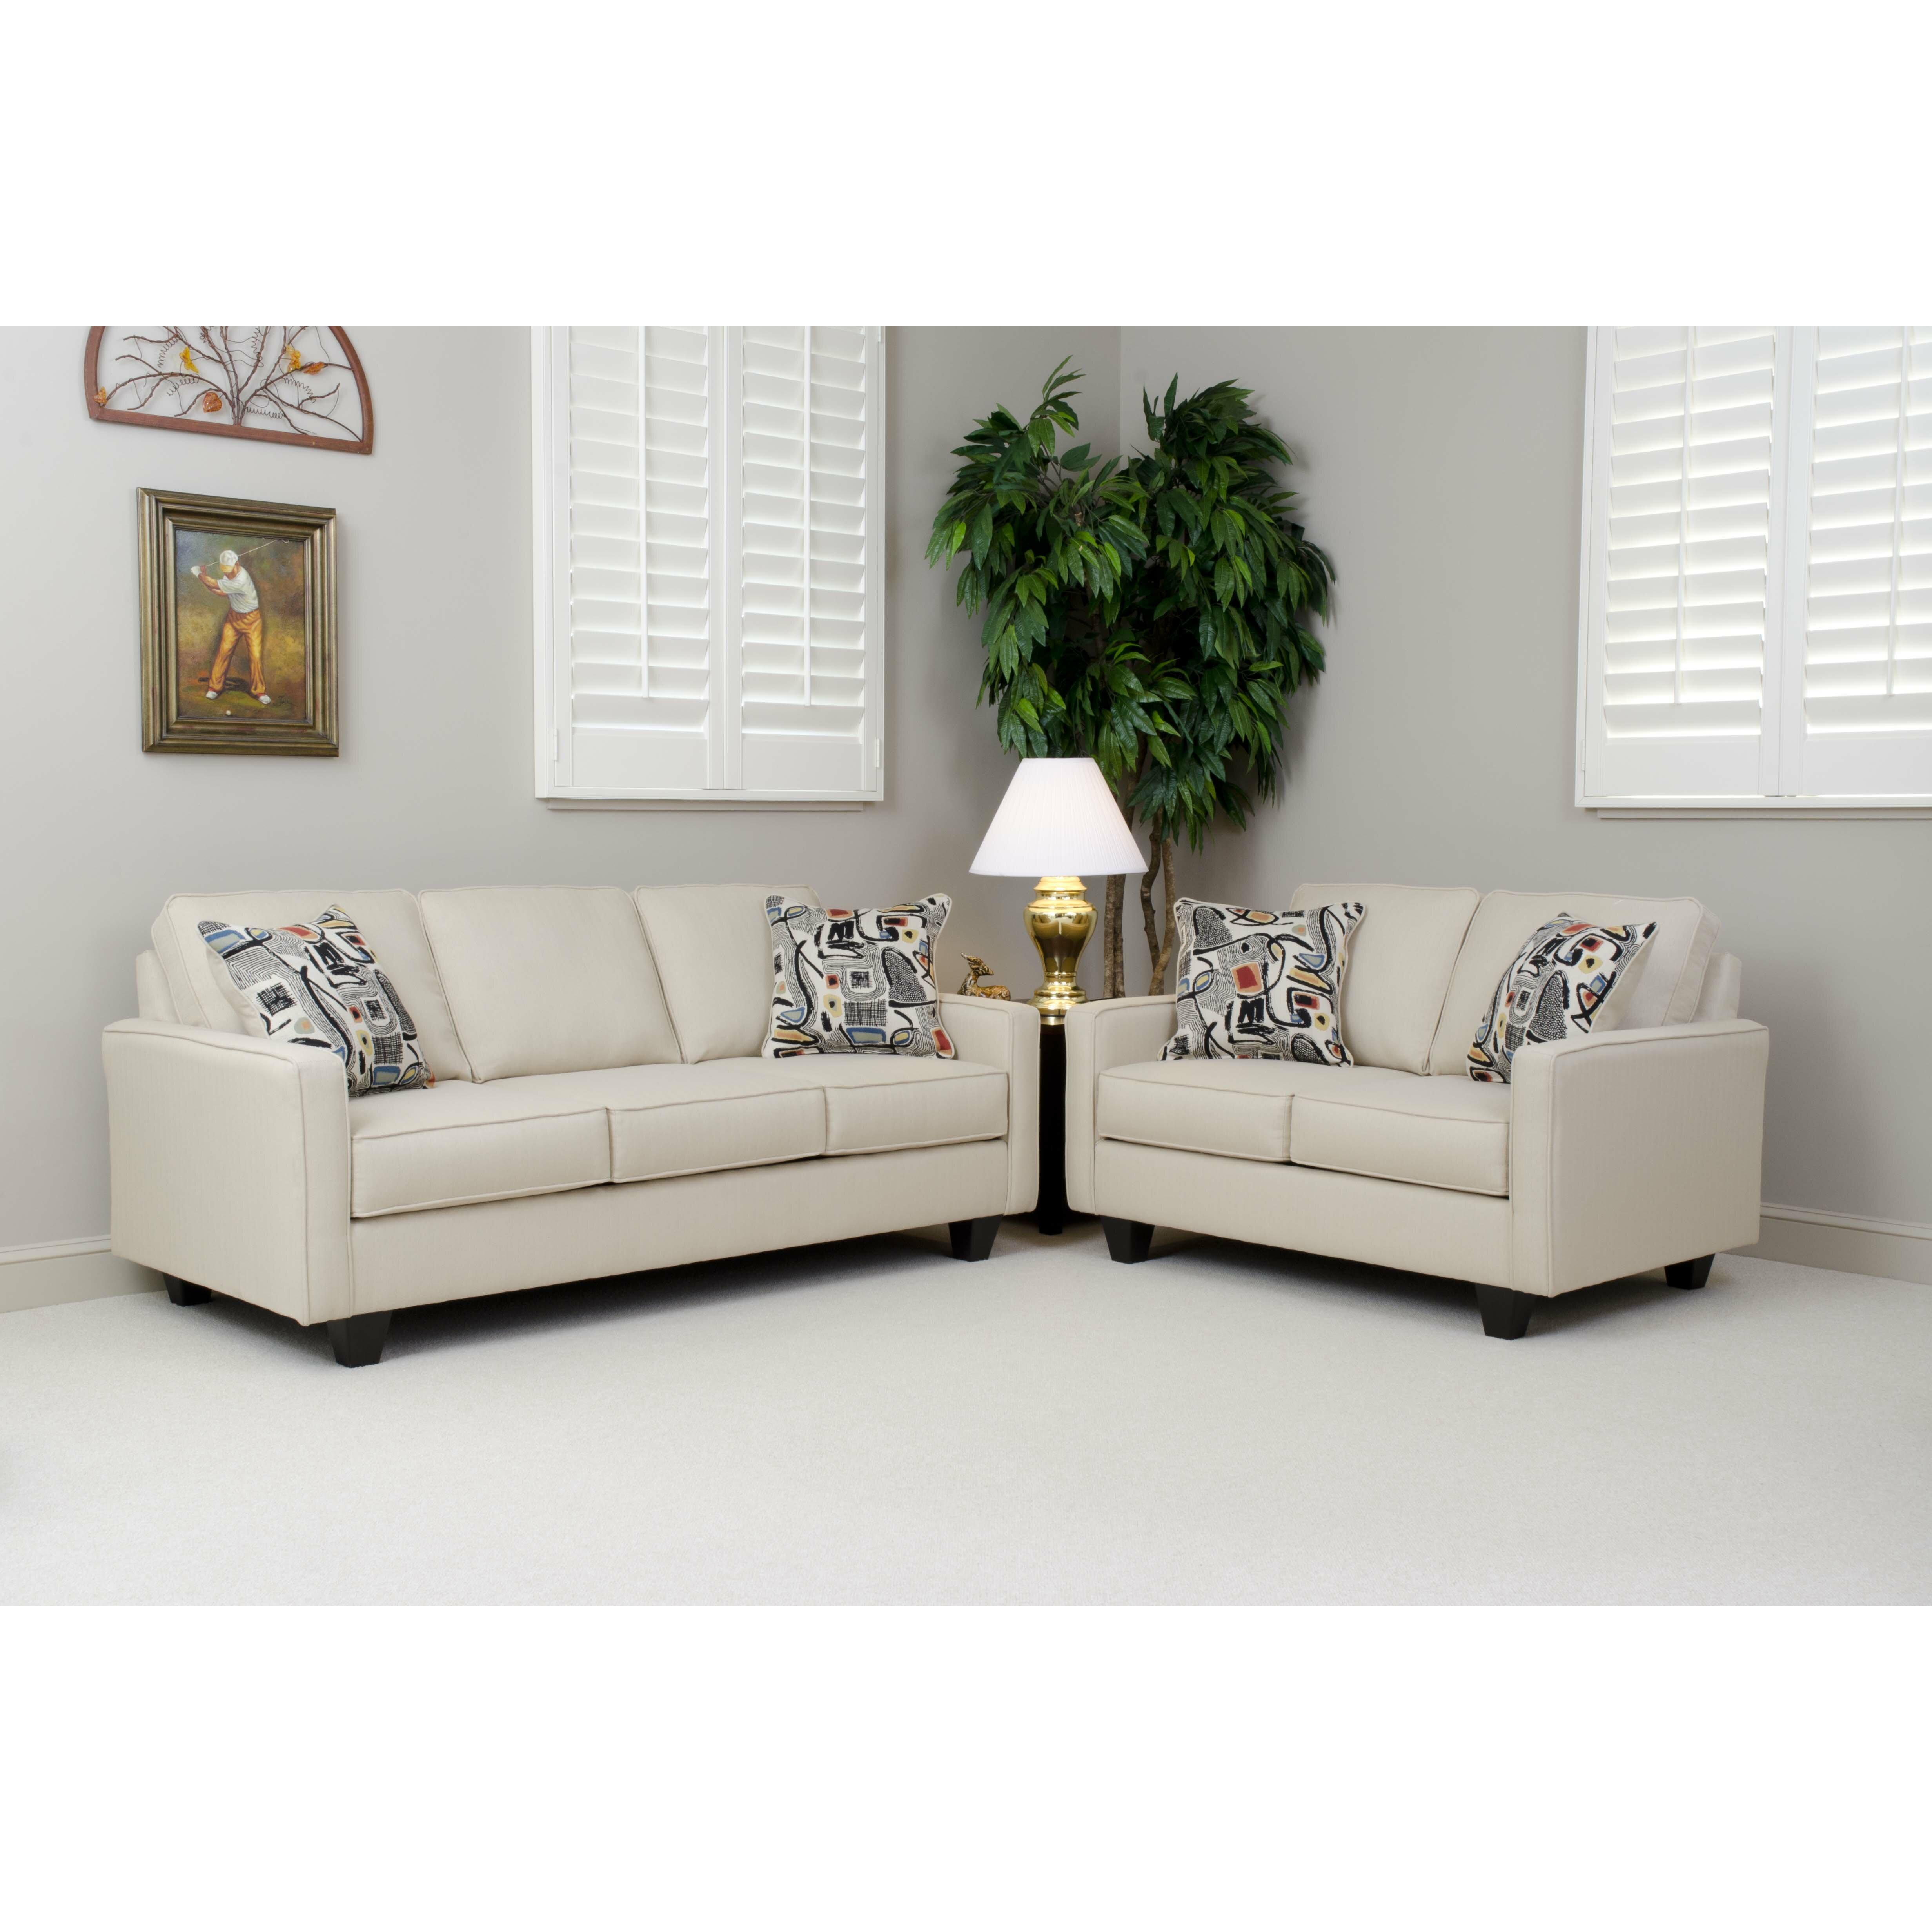 Mercury Row Serta Upholstery Aries Living Room Collection Reviews Wayfair